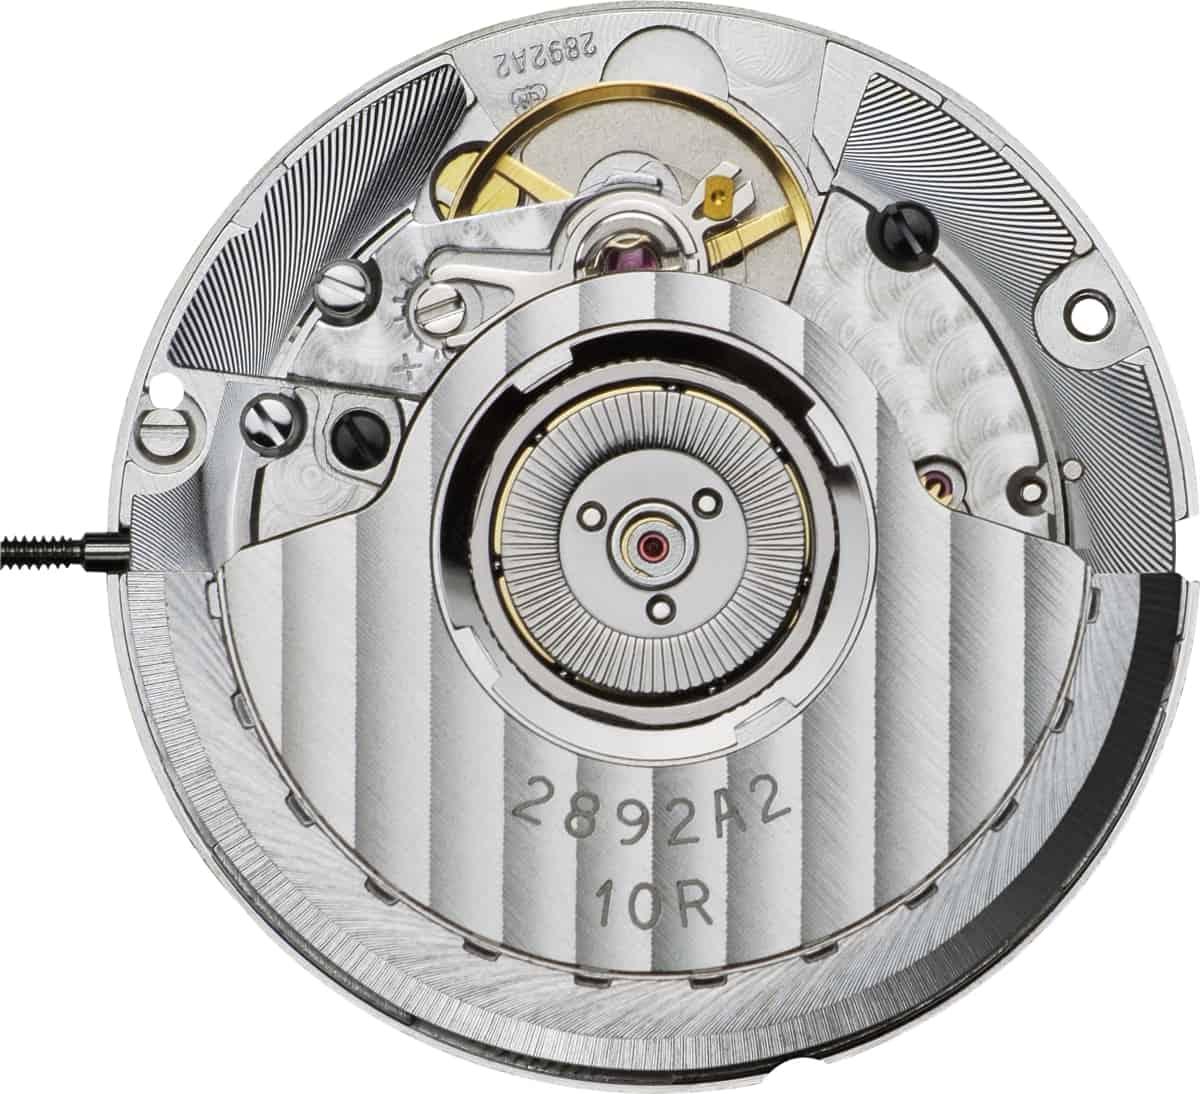 Das Automatikkaliber Eta 2824-A2 arbeitet mit 4 Hertz